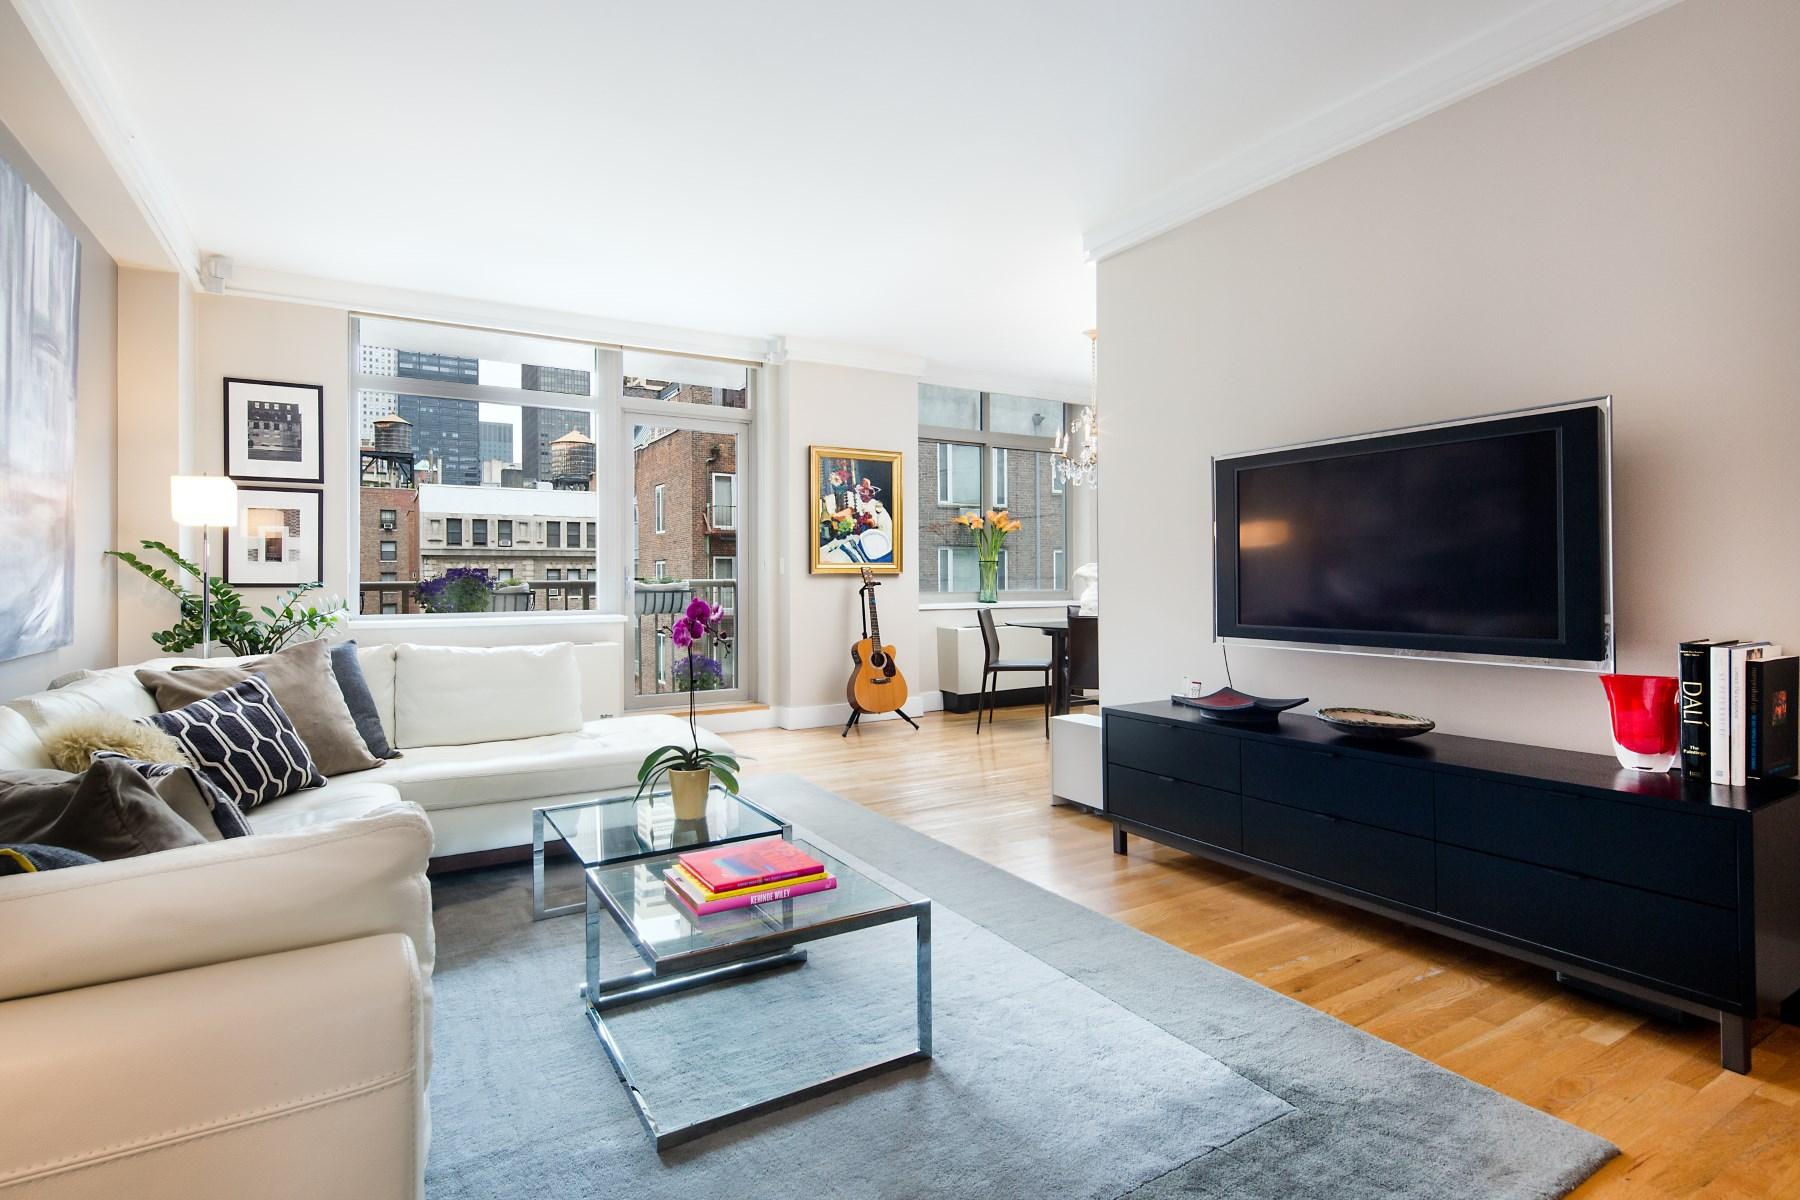 Кооперативная квартира для того Продажа на Stunning 2 Bedroom Condo in Murray Hill 143 East 34th Street Apt 9N Murray Hill, New York, Нью-Йорк, 10016 Соединенные Штаты